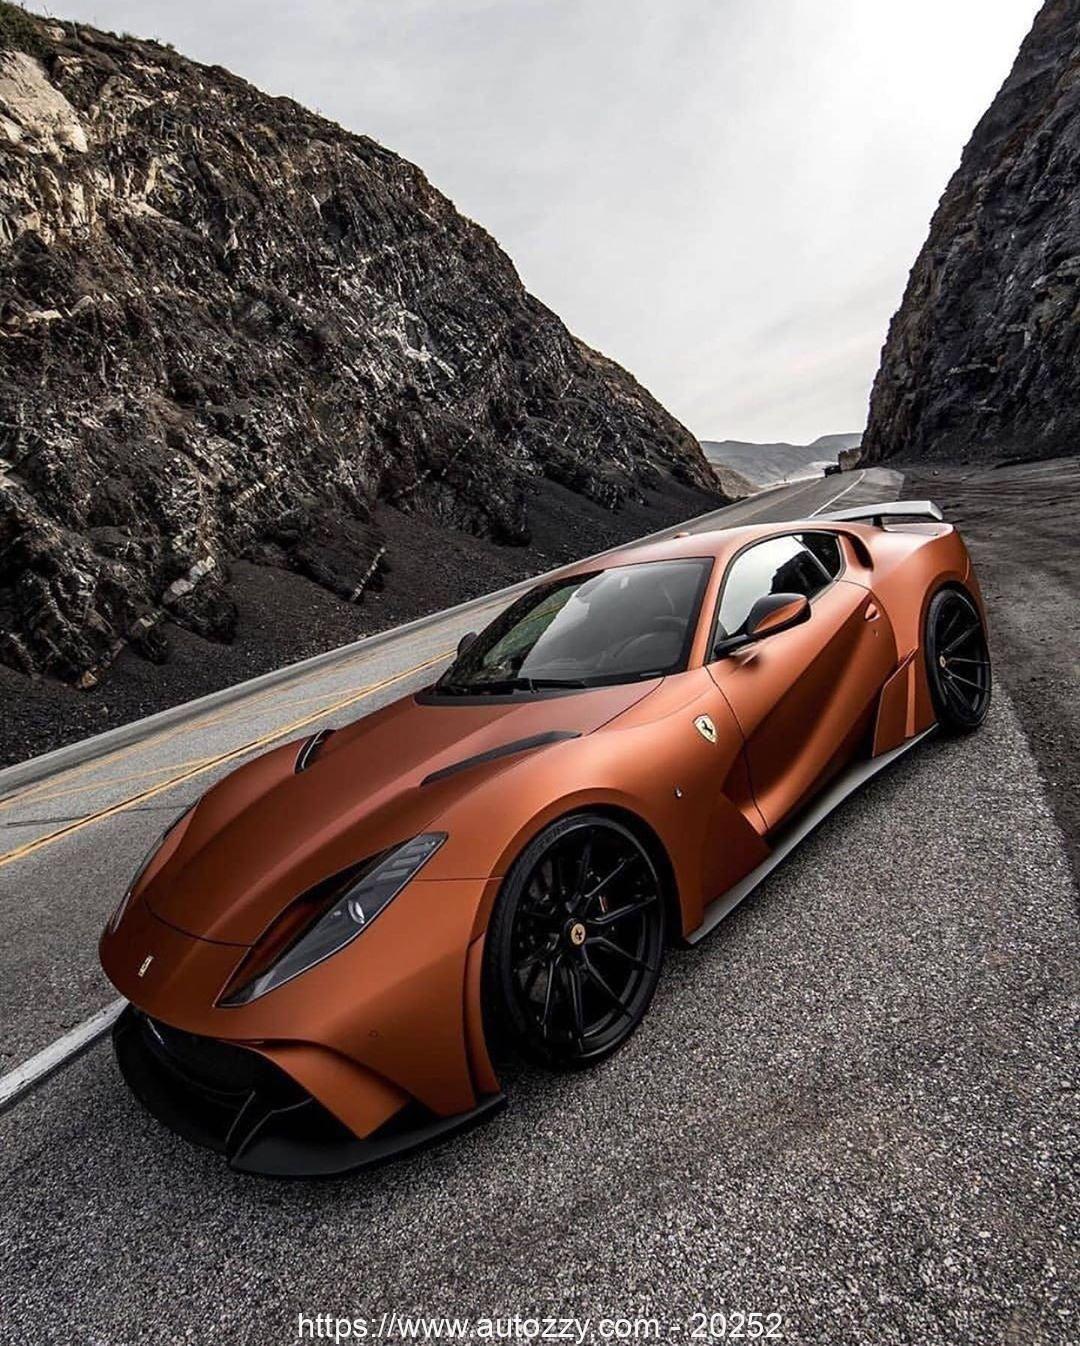 Novitec 812 Superfast Raw Automatic Automotive Cars Drive Automatic Automotive In 2020 Car Vehicles Classic Cars